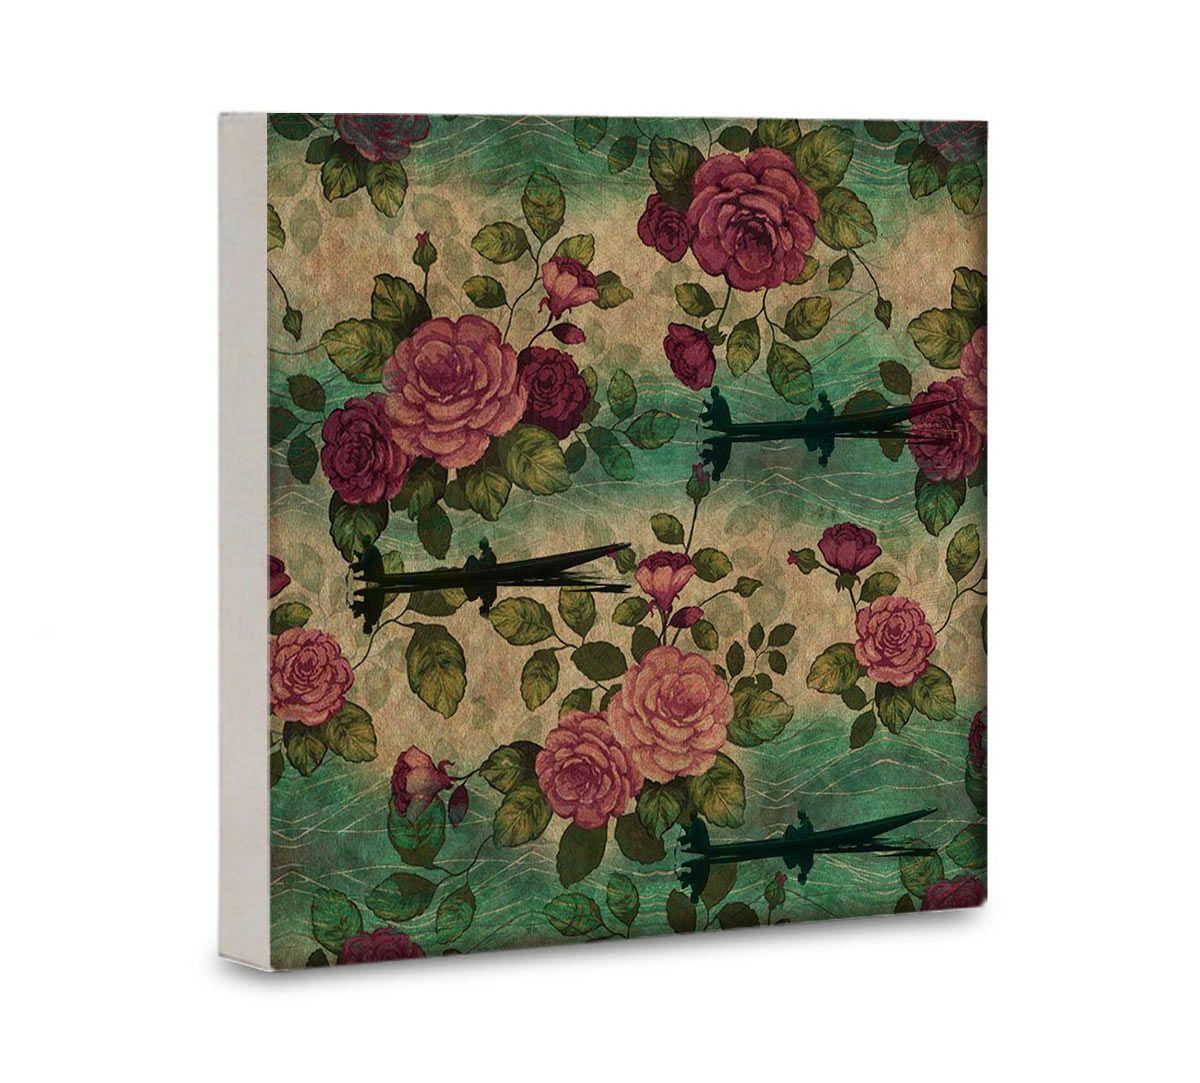 India Cirucs Lakeside Roses Canvas Wall Art